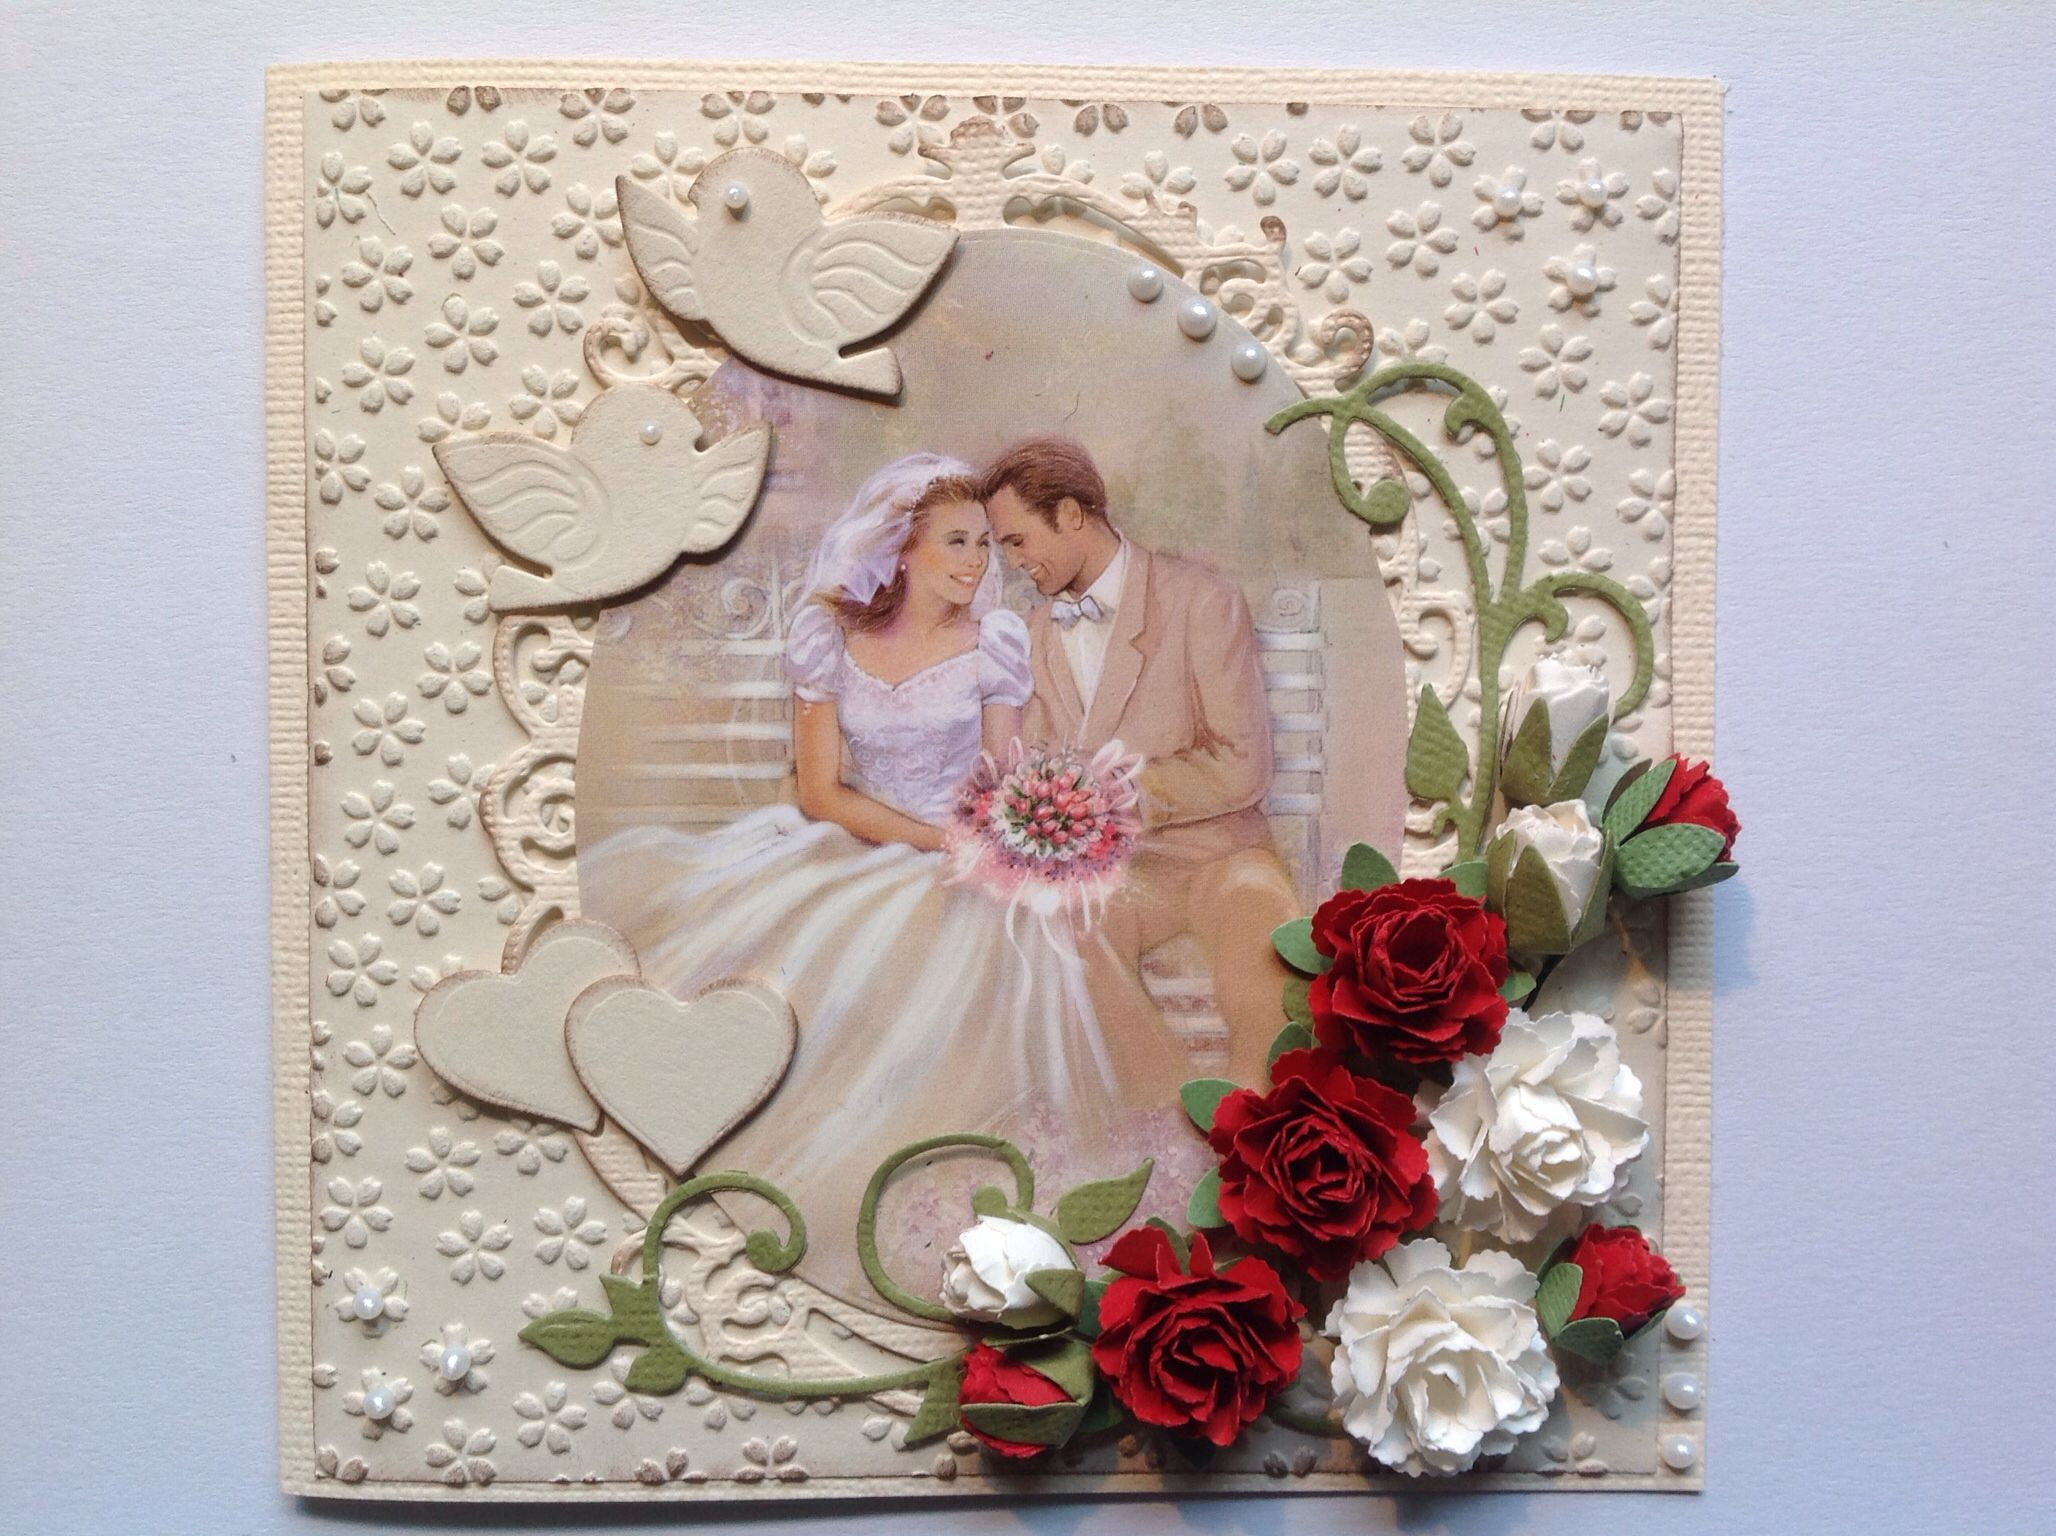 Бумажная свадьба скрапбукинг открытка